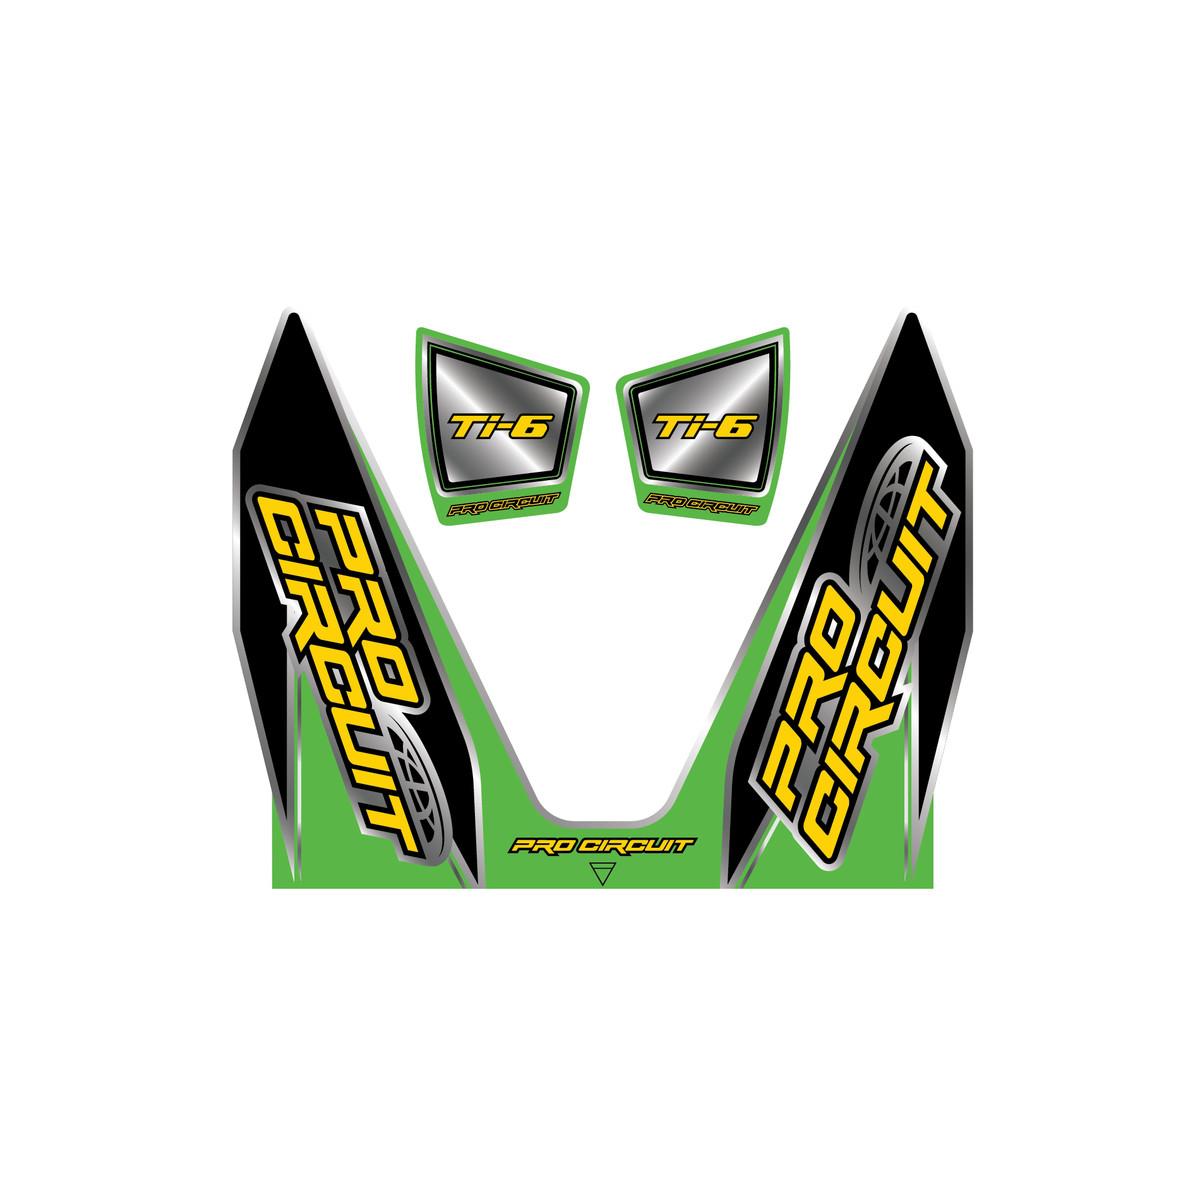 pro circuit ti 6 exhaust graphics kx green style 1